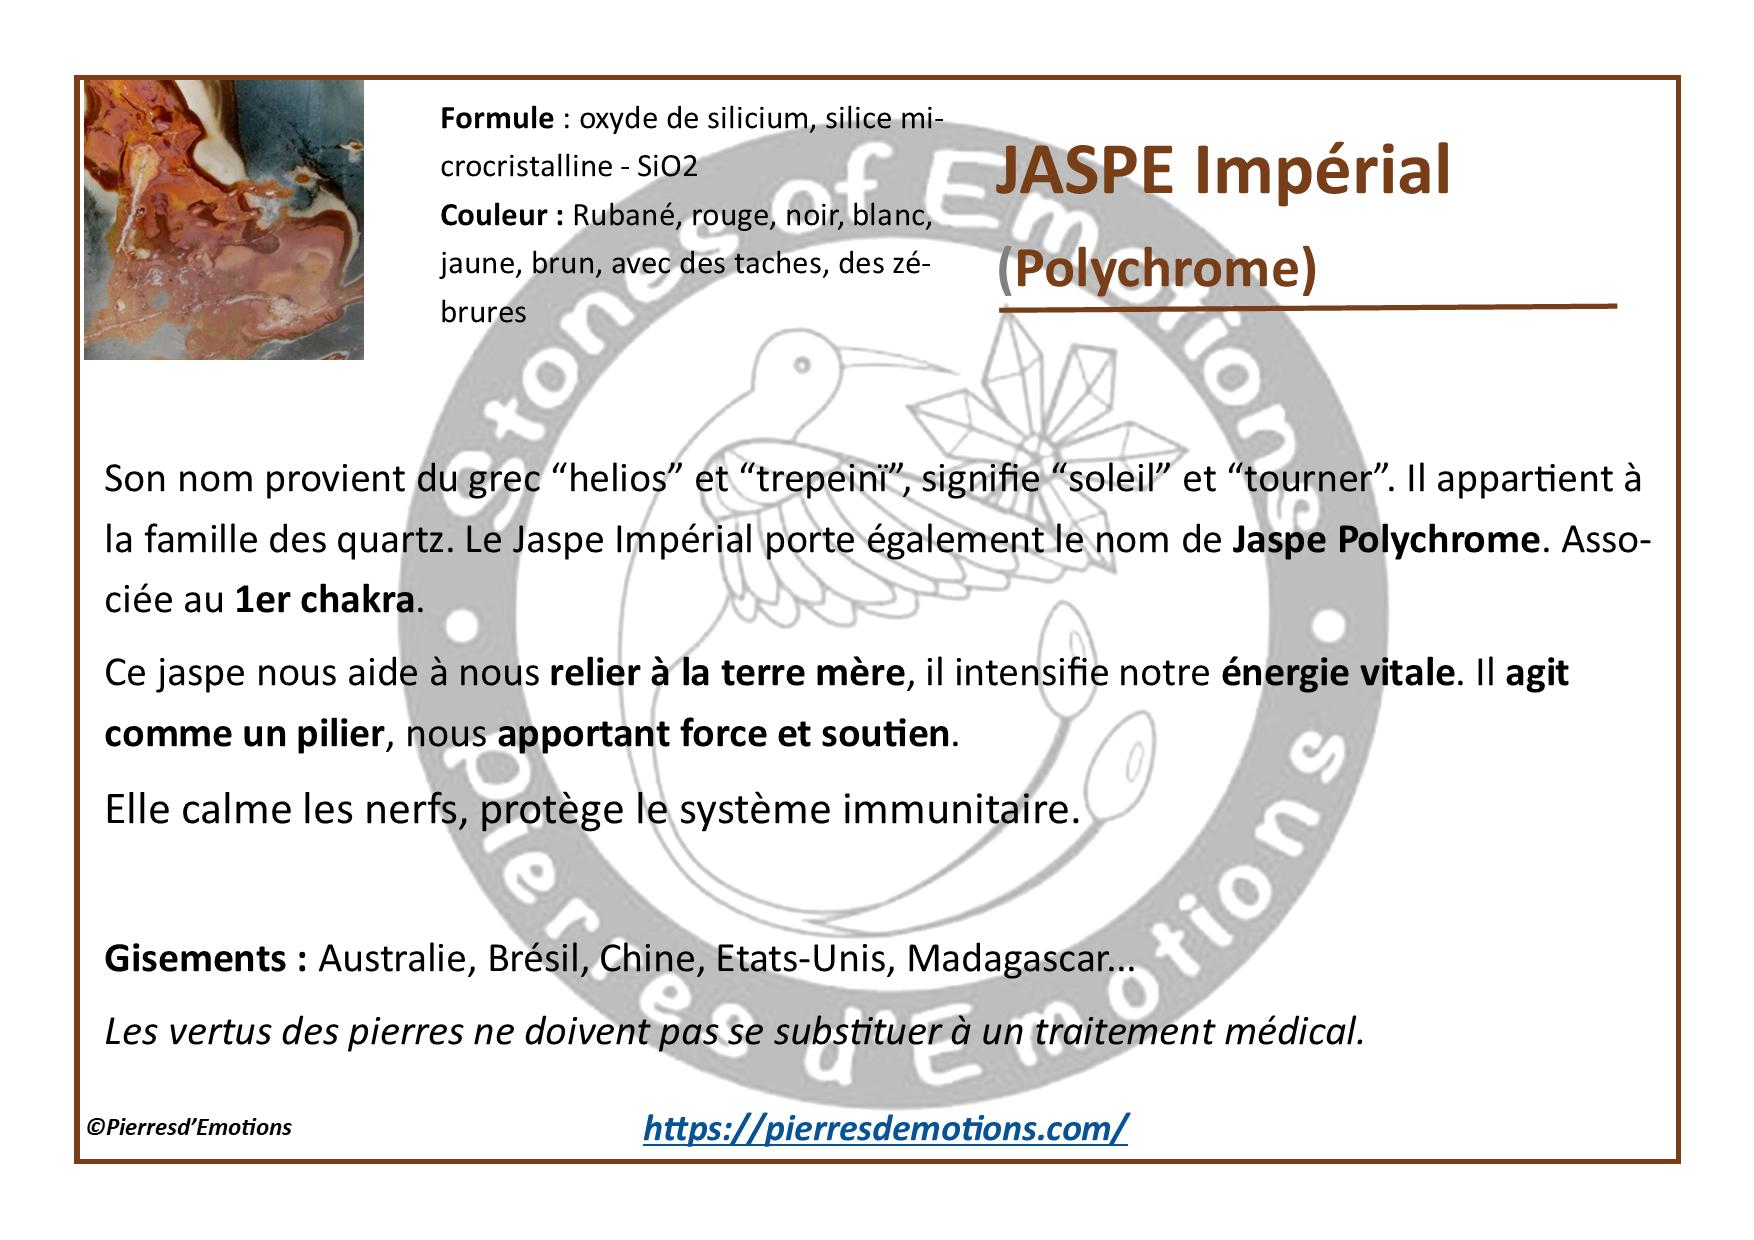 JaspeImperial